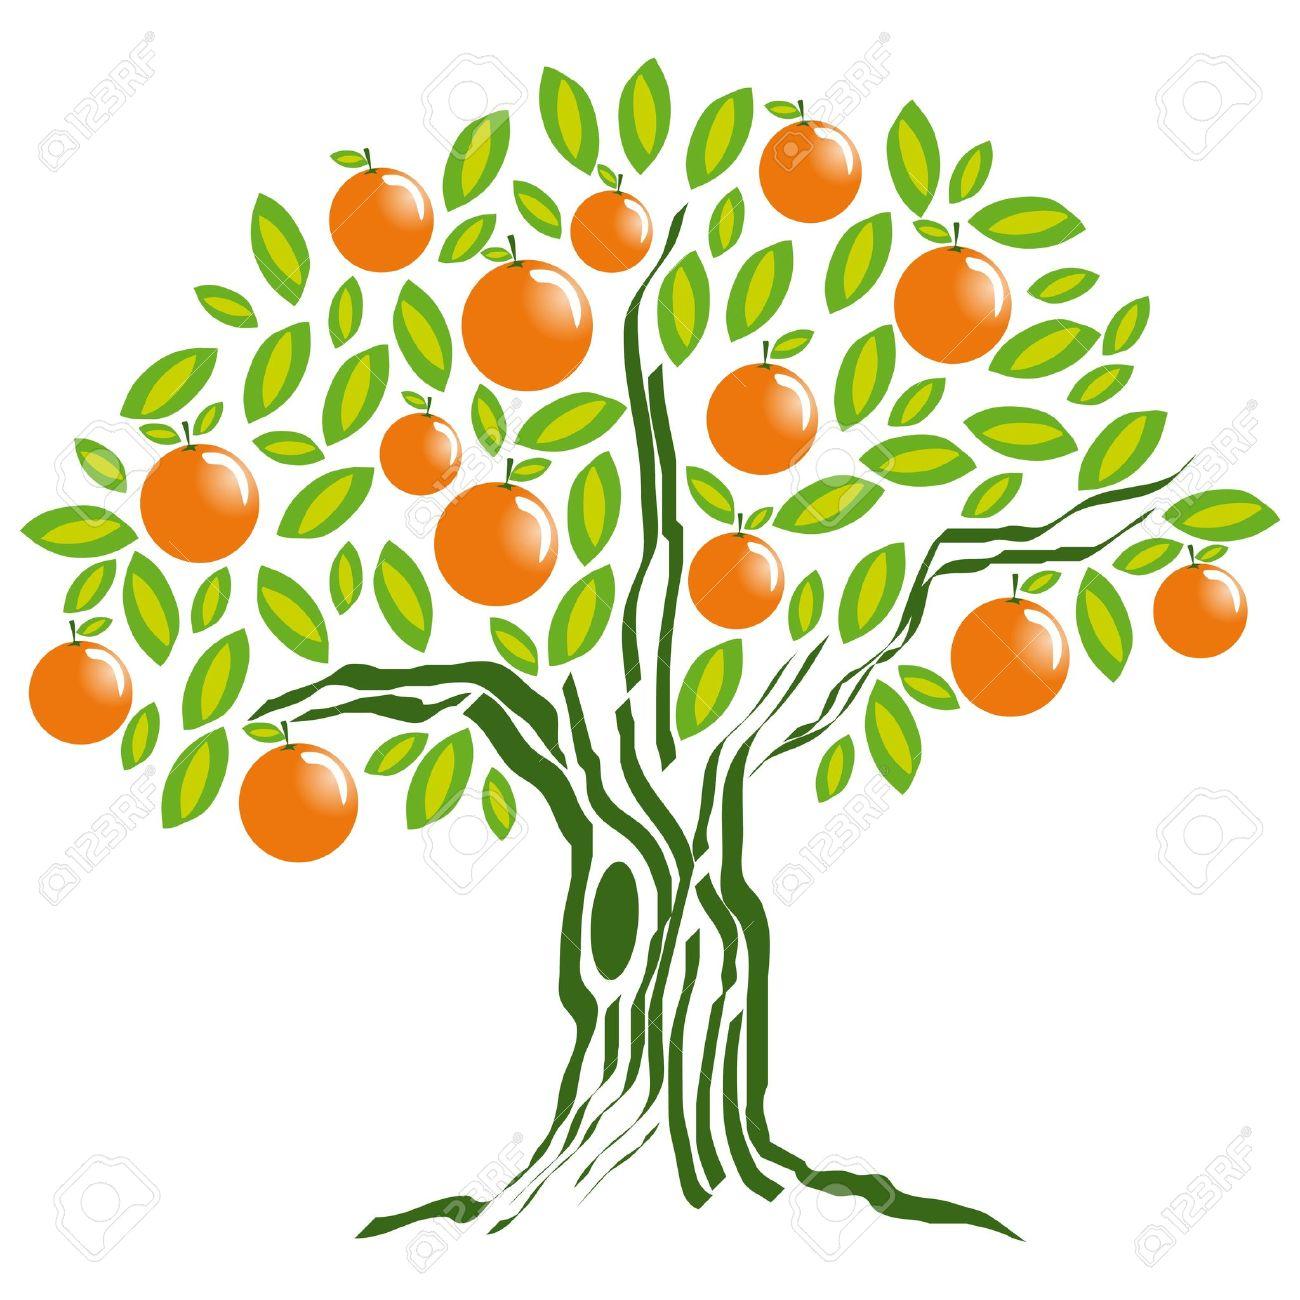 Tangerine tree clipart.